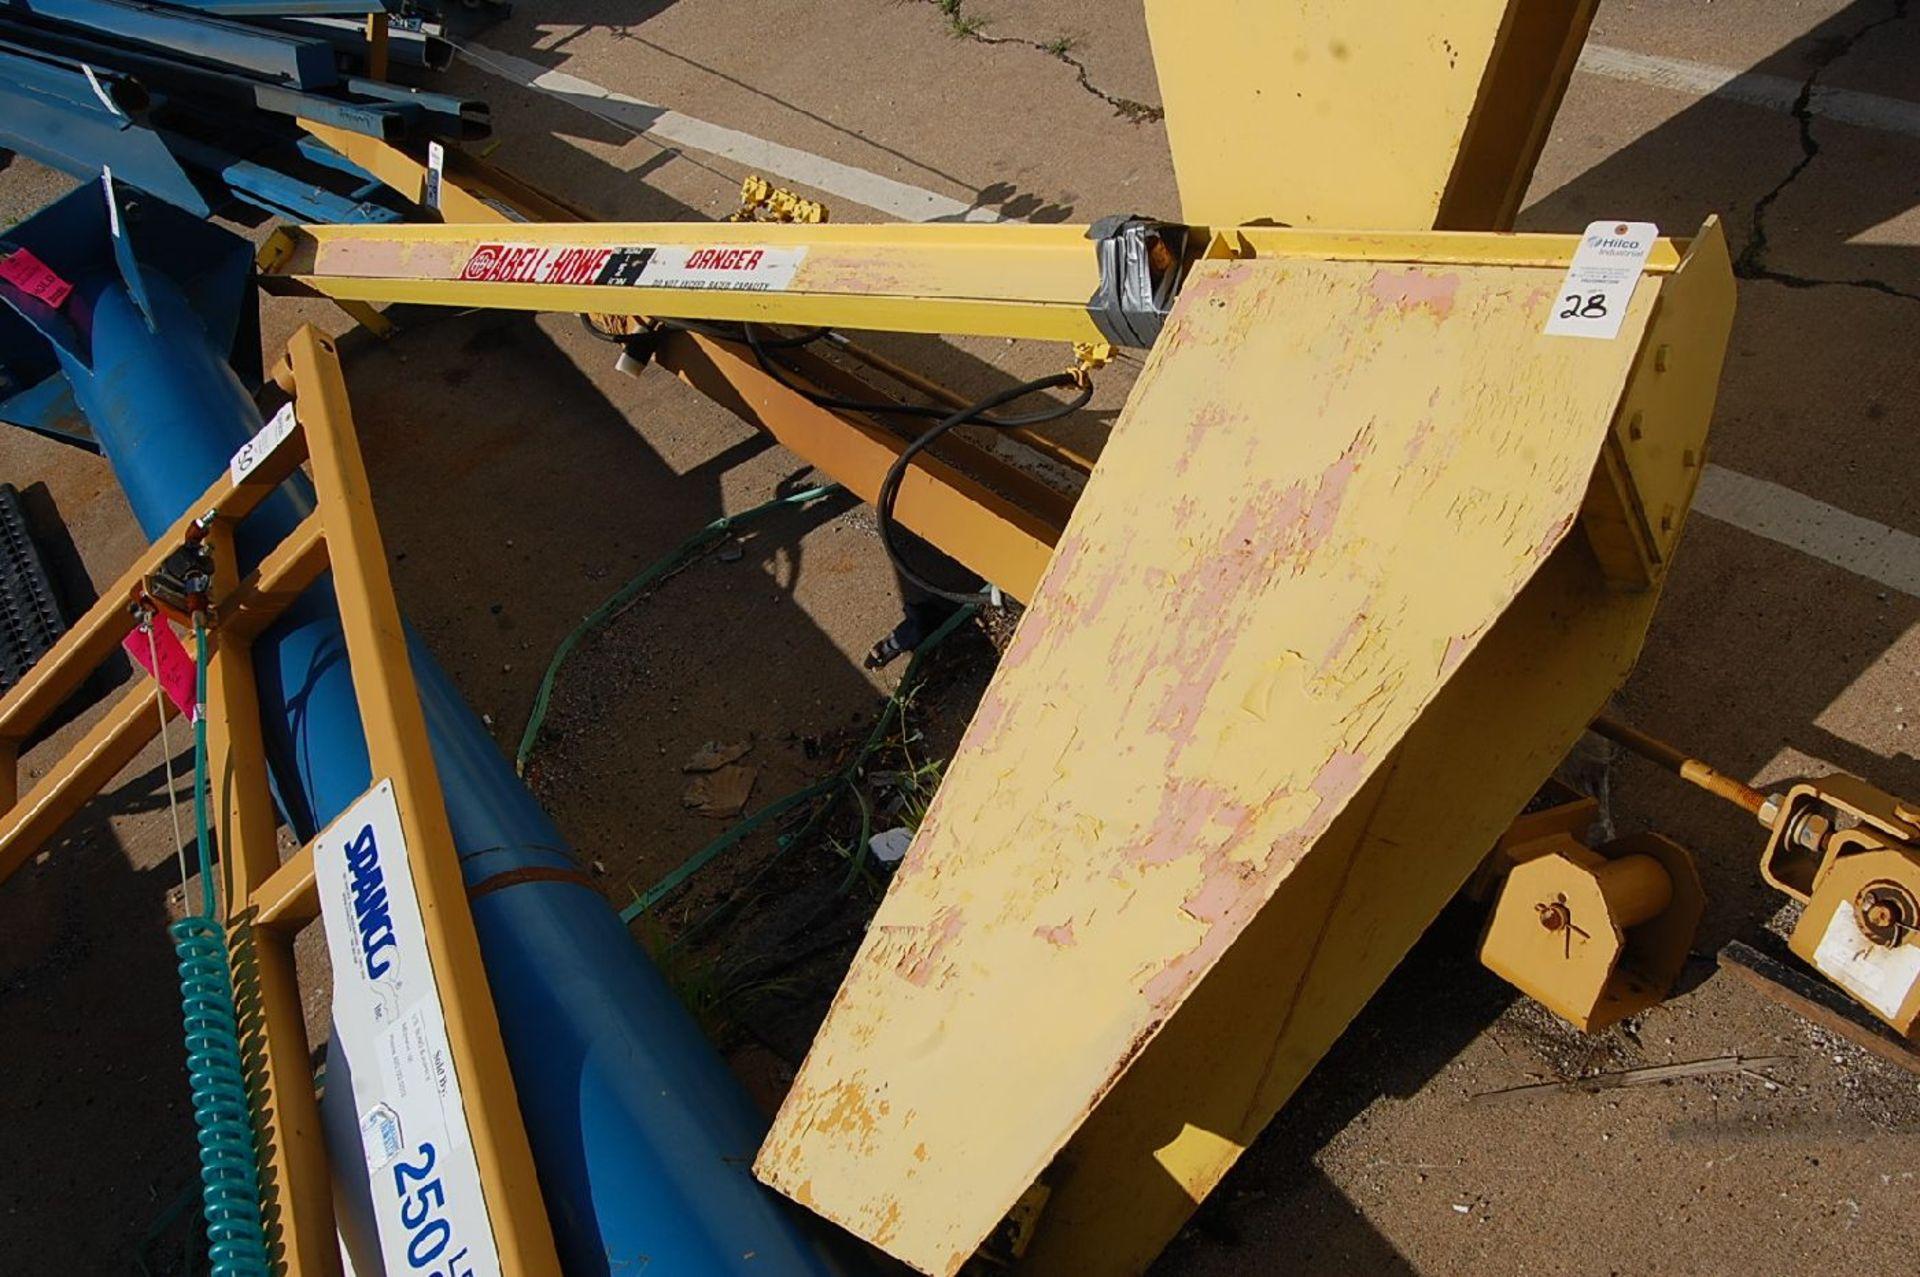 Lot 28 - Abell-Howe 1/2-Ton Floor Standing Jib Crane